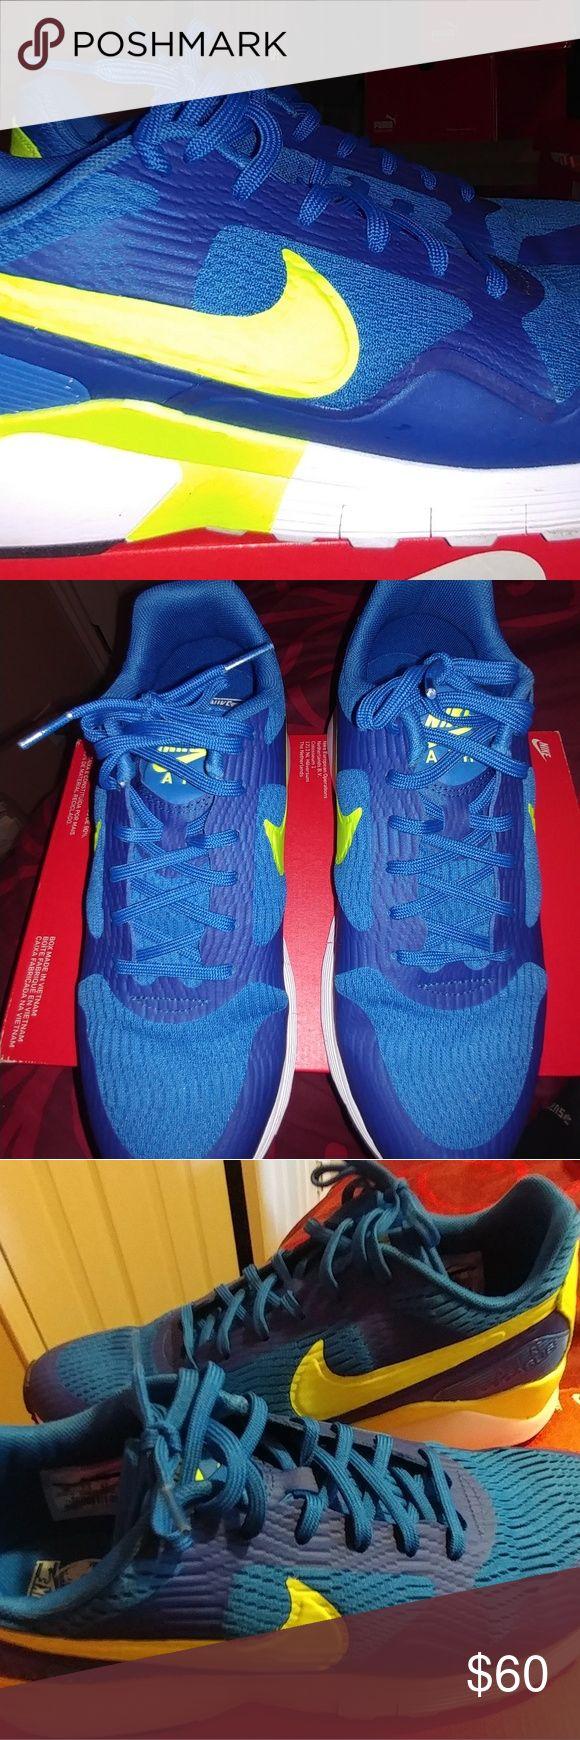 Women's Nike Air Pegasus Blue spark/volt (greenish-yellow)/white Nike Shoes Athletic Shoes